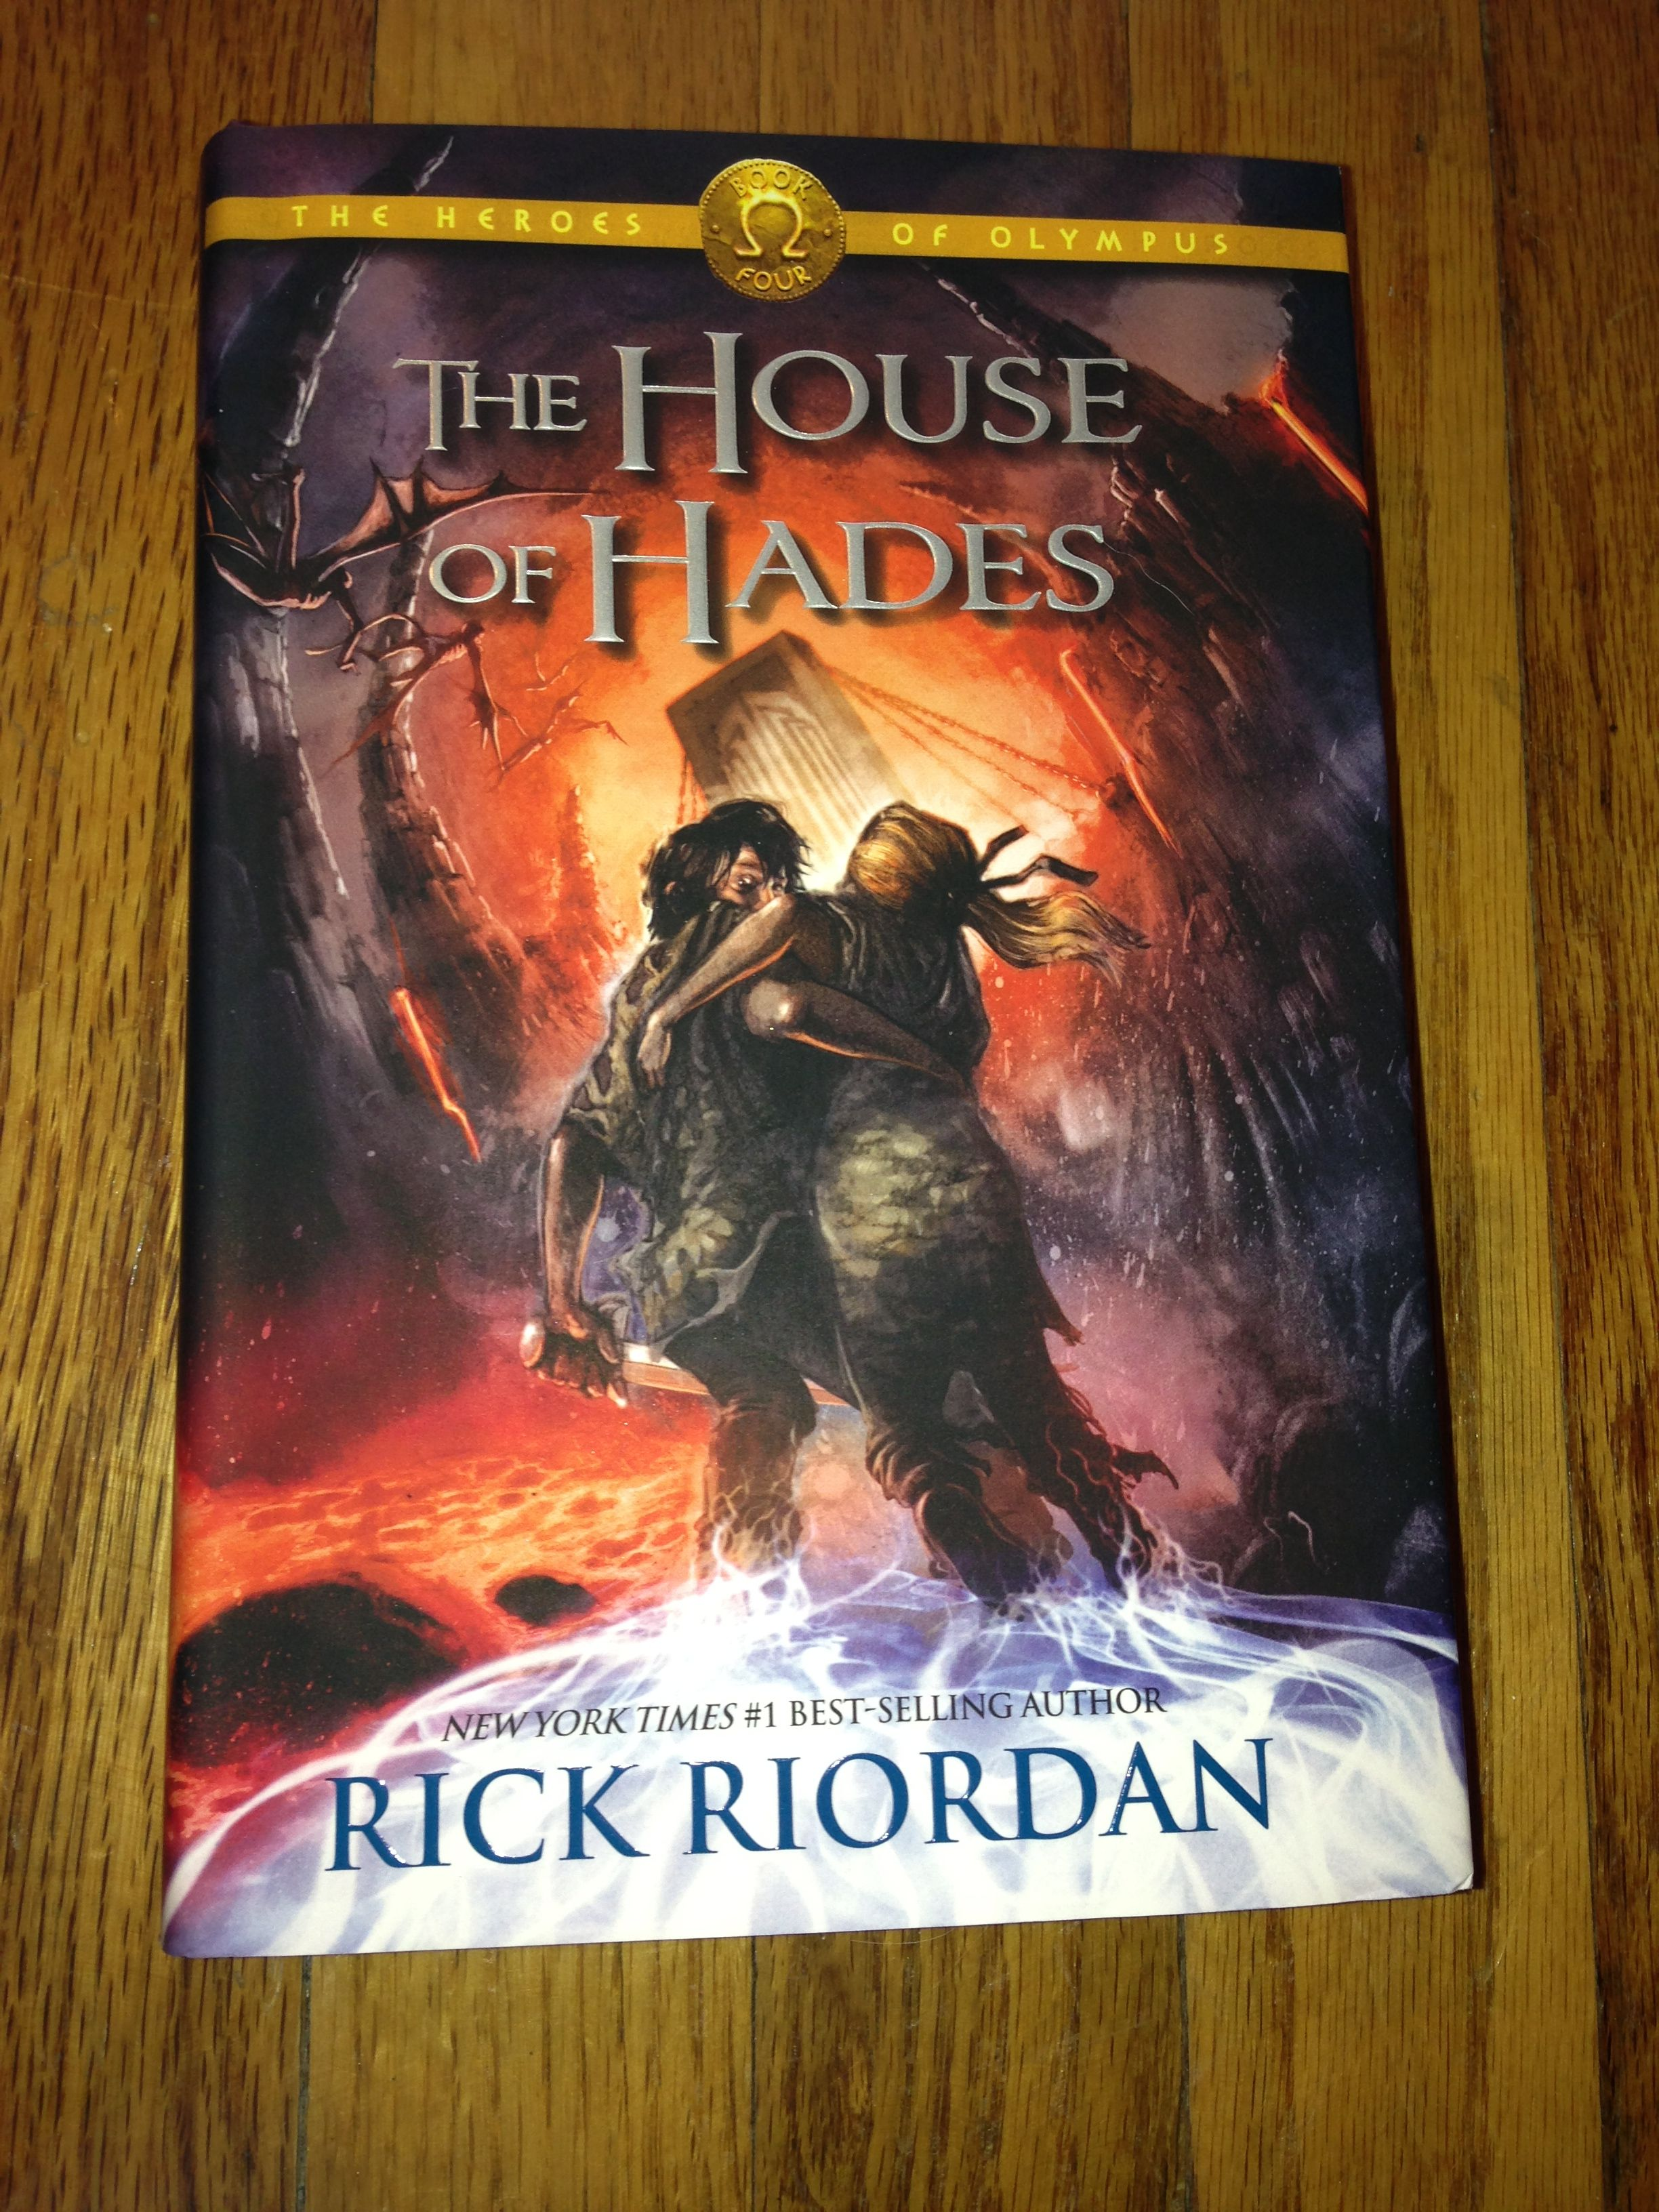 House of hades rick riordan book consider, that